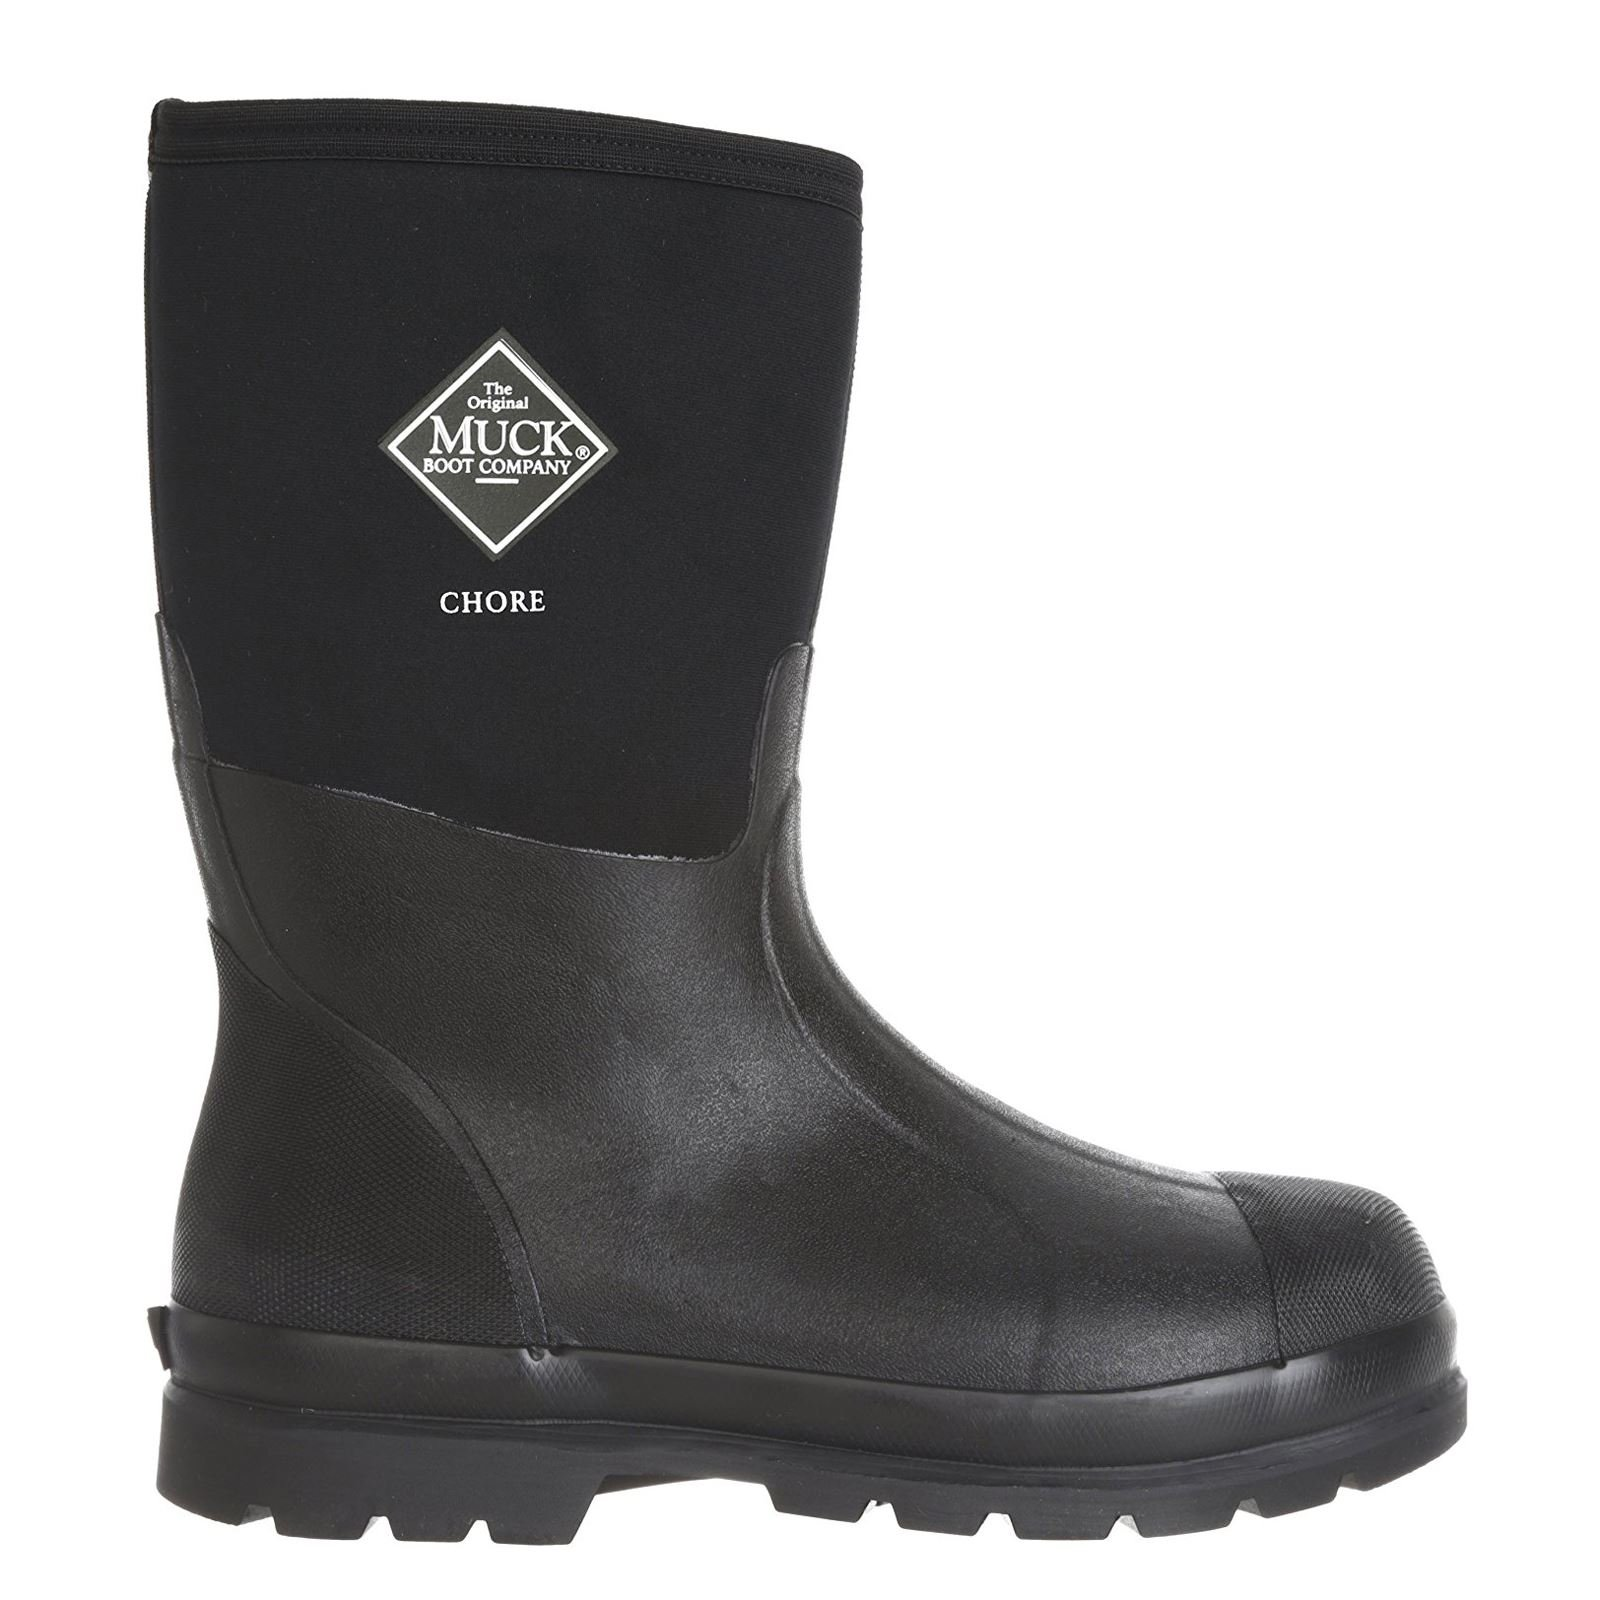 The Original MuckBoots Adult Chore Mid Boot,Black,Men's 9 M/Women's 10 M